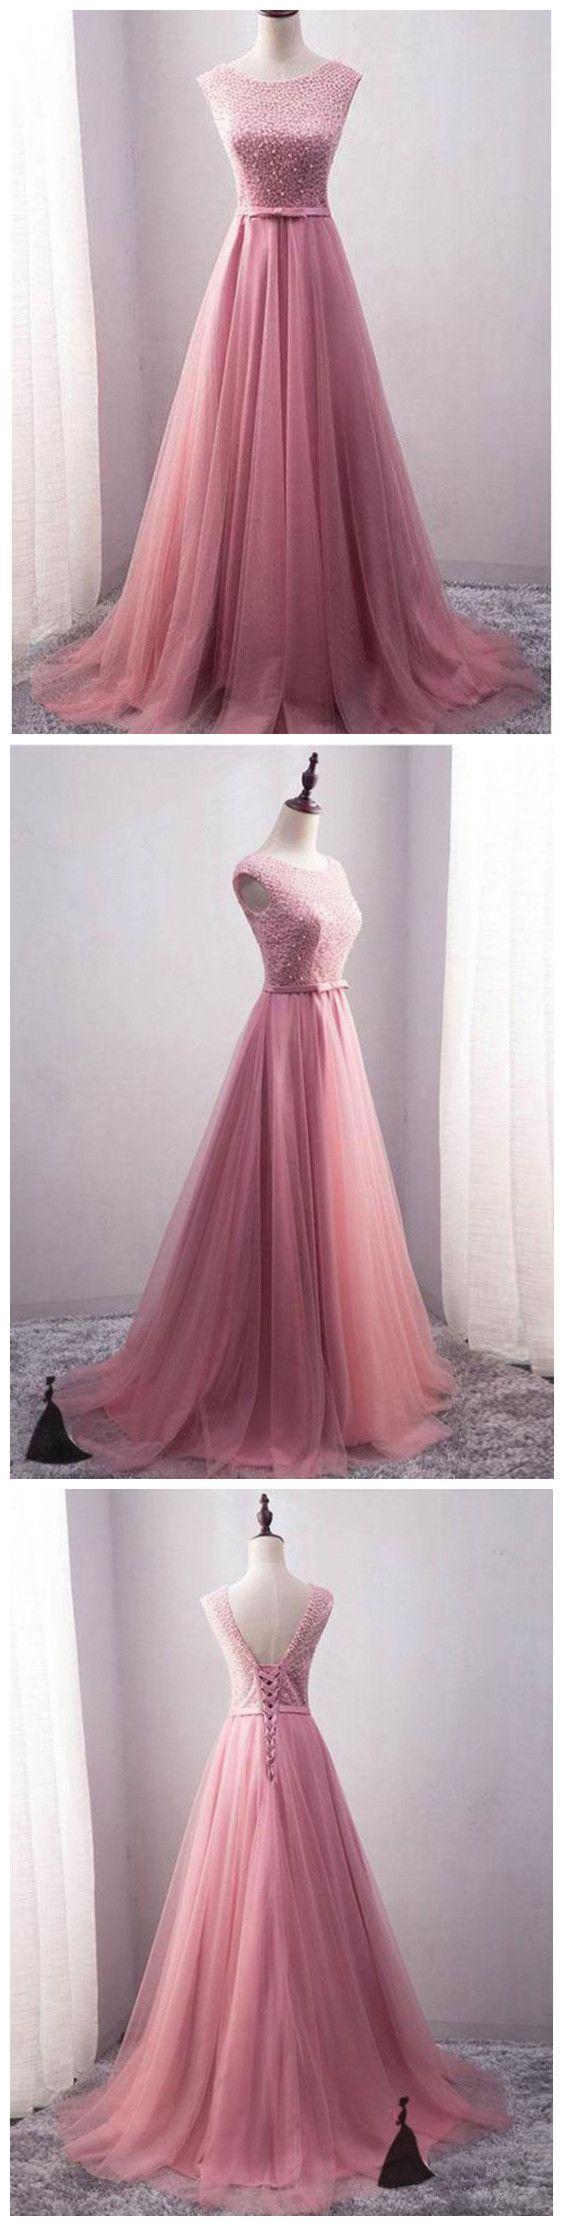 aline scoop prom dresses pink long prom dresses evening